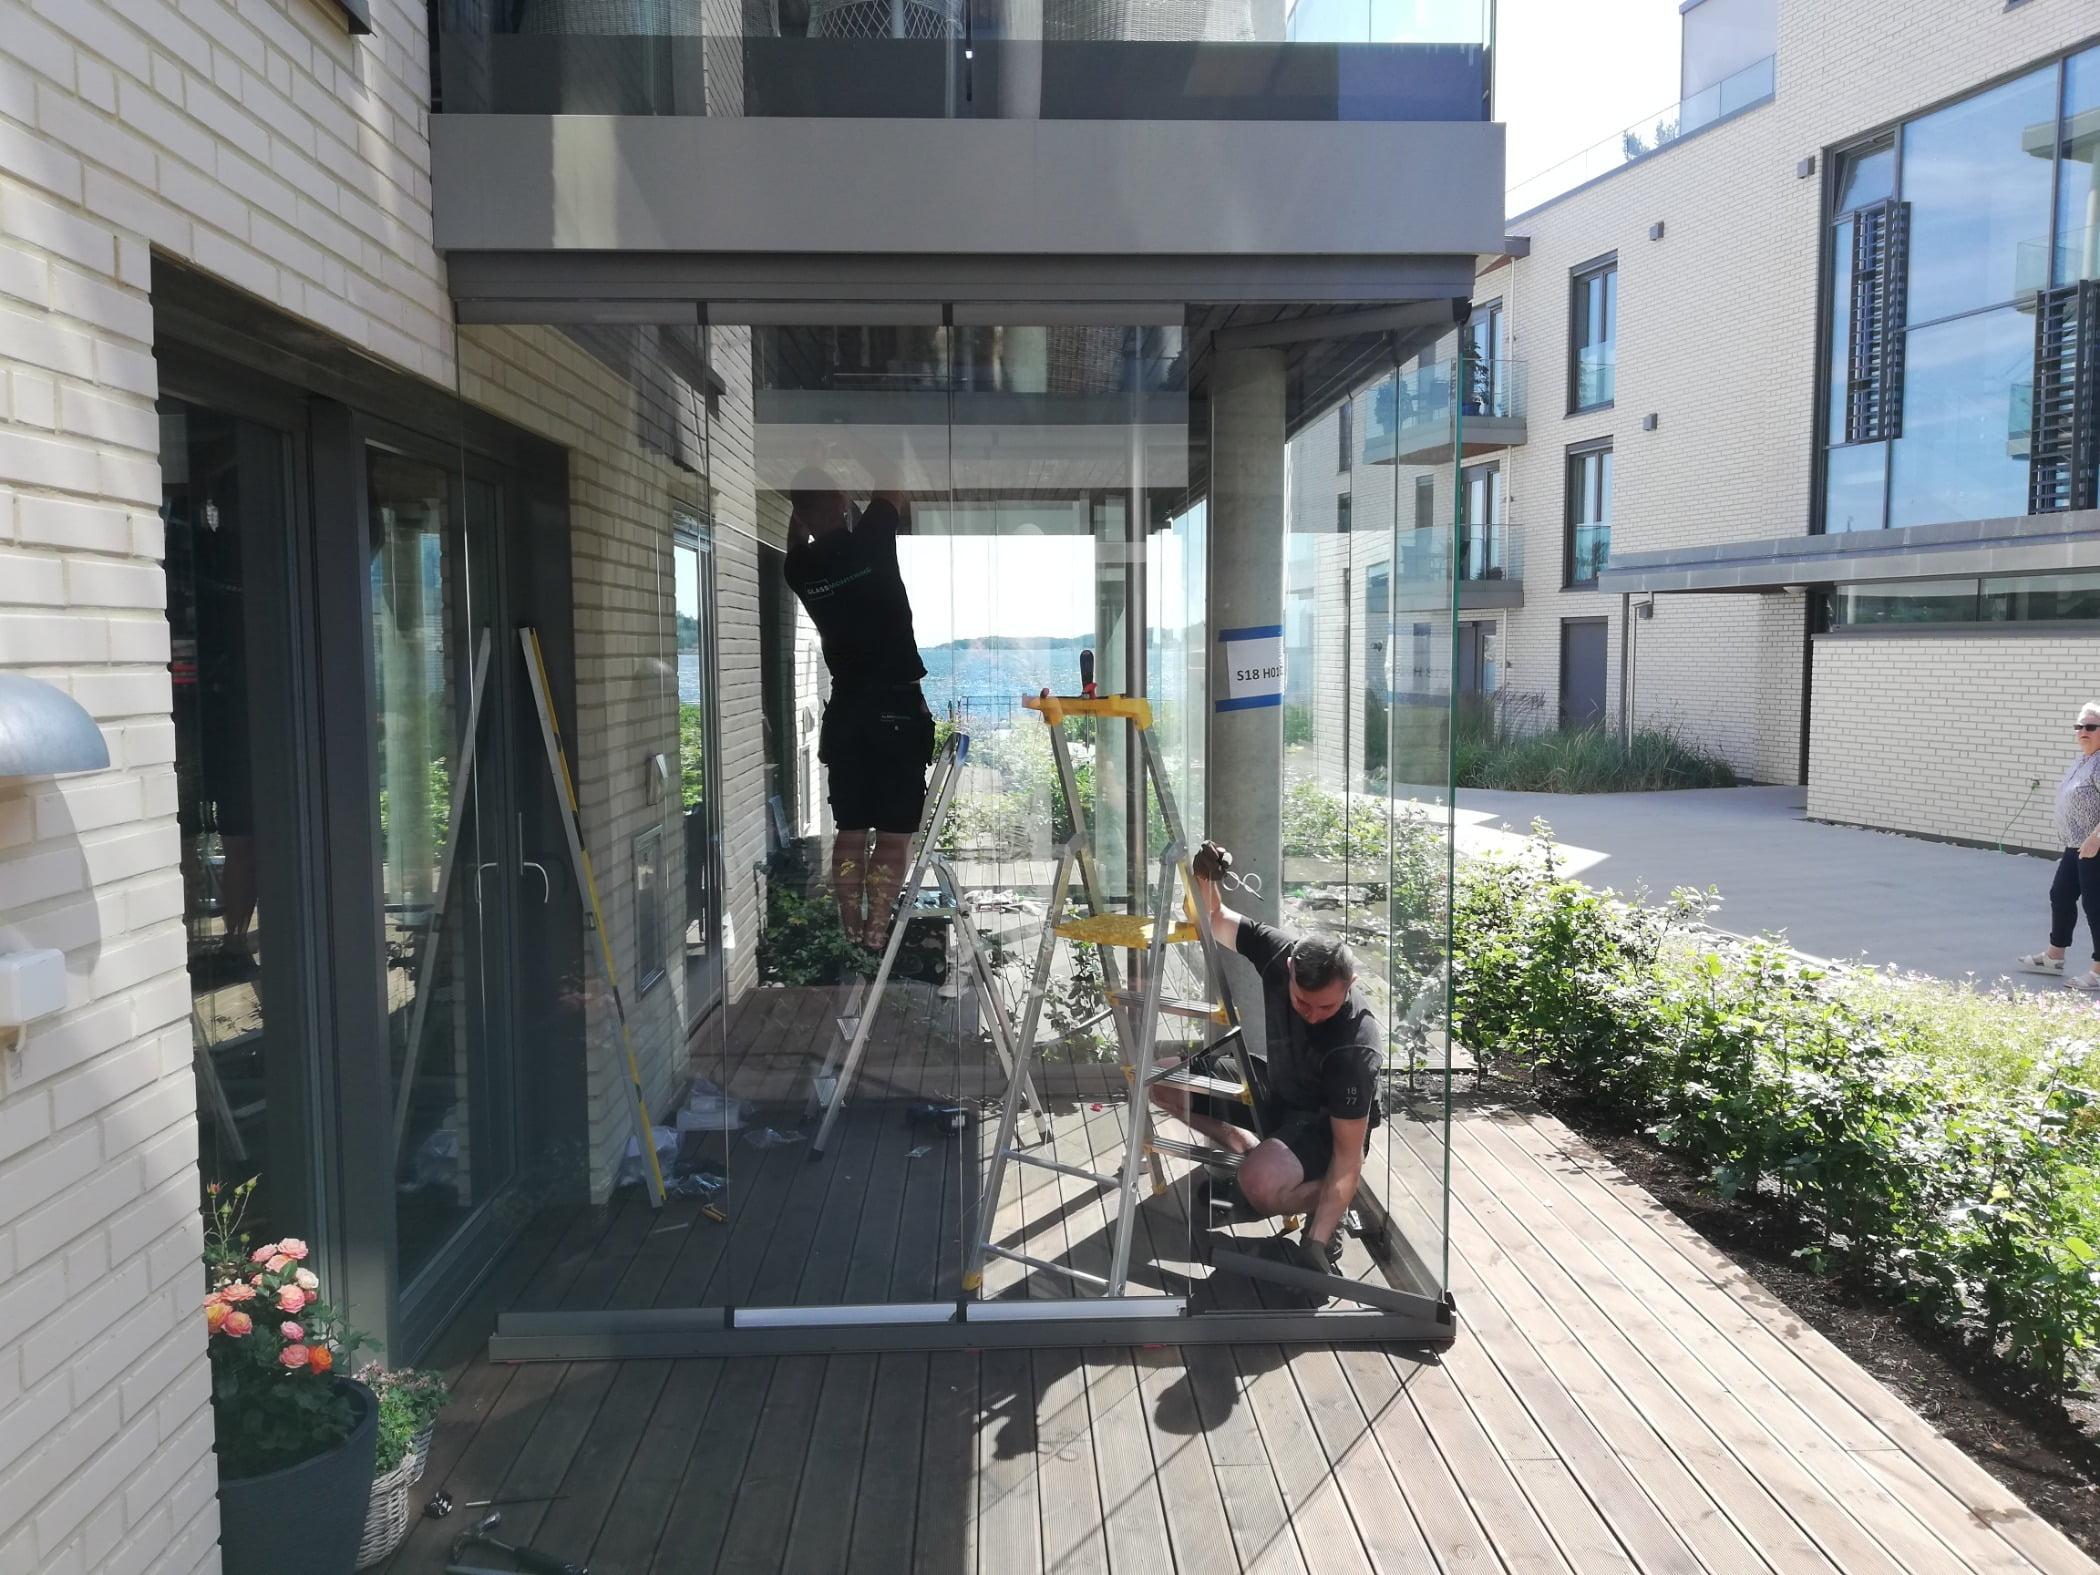 Road surface, Urban design, Plant, Window, Building, Flowerpot, Neighbourhood, Sidewalk, Houseplant